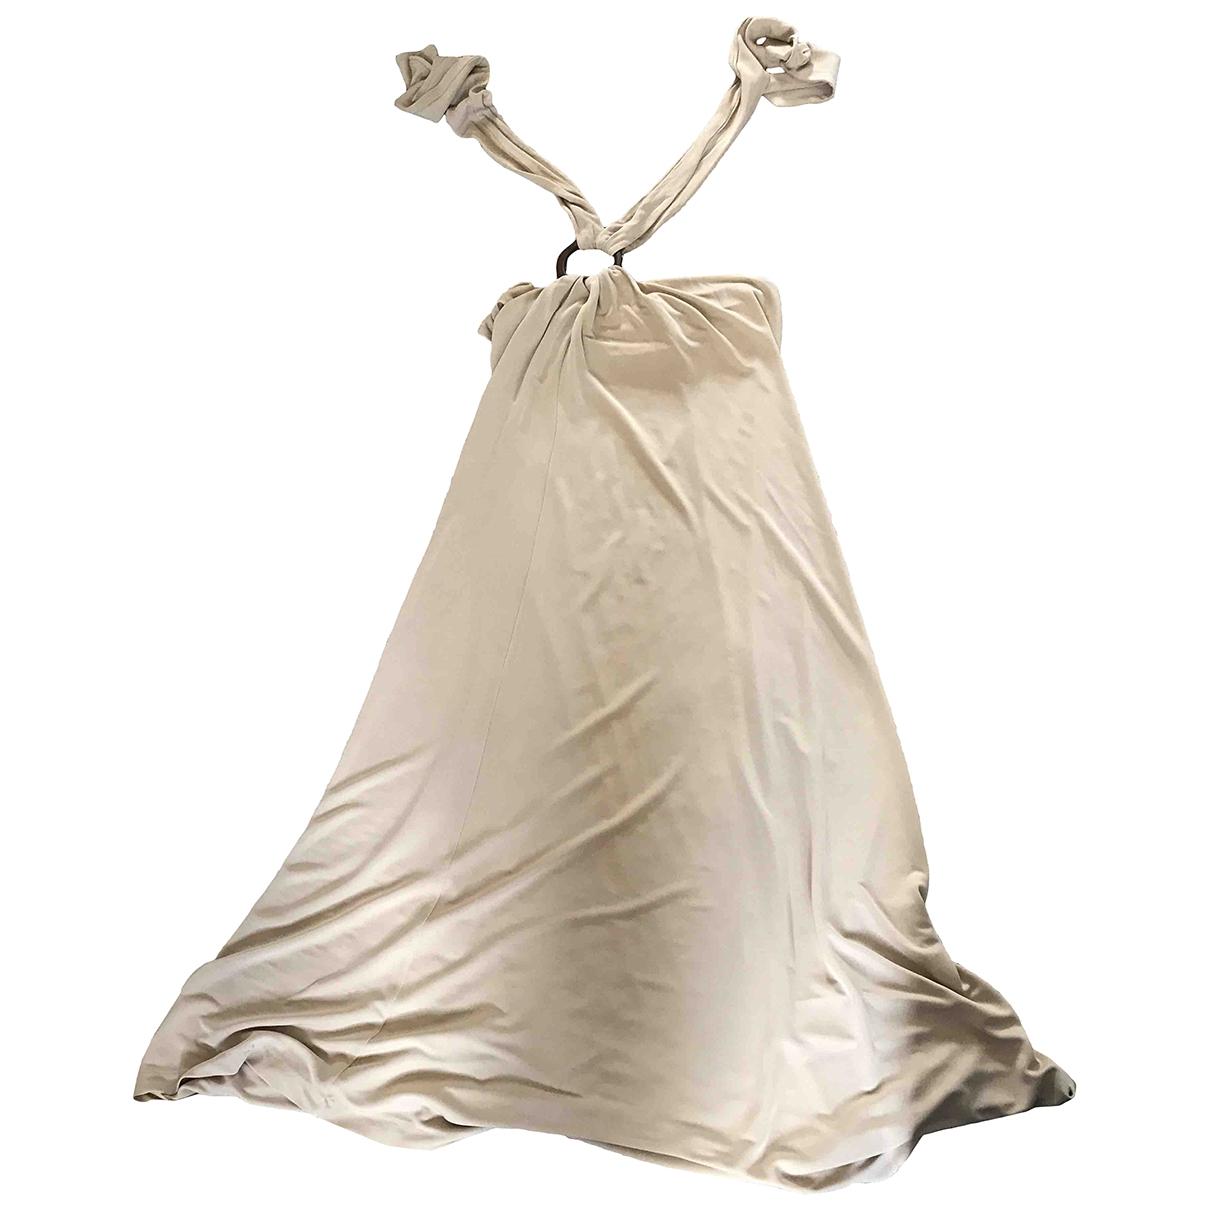 Massimo Dutti \N Beige dress for Women L International